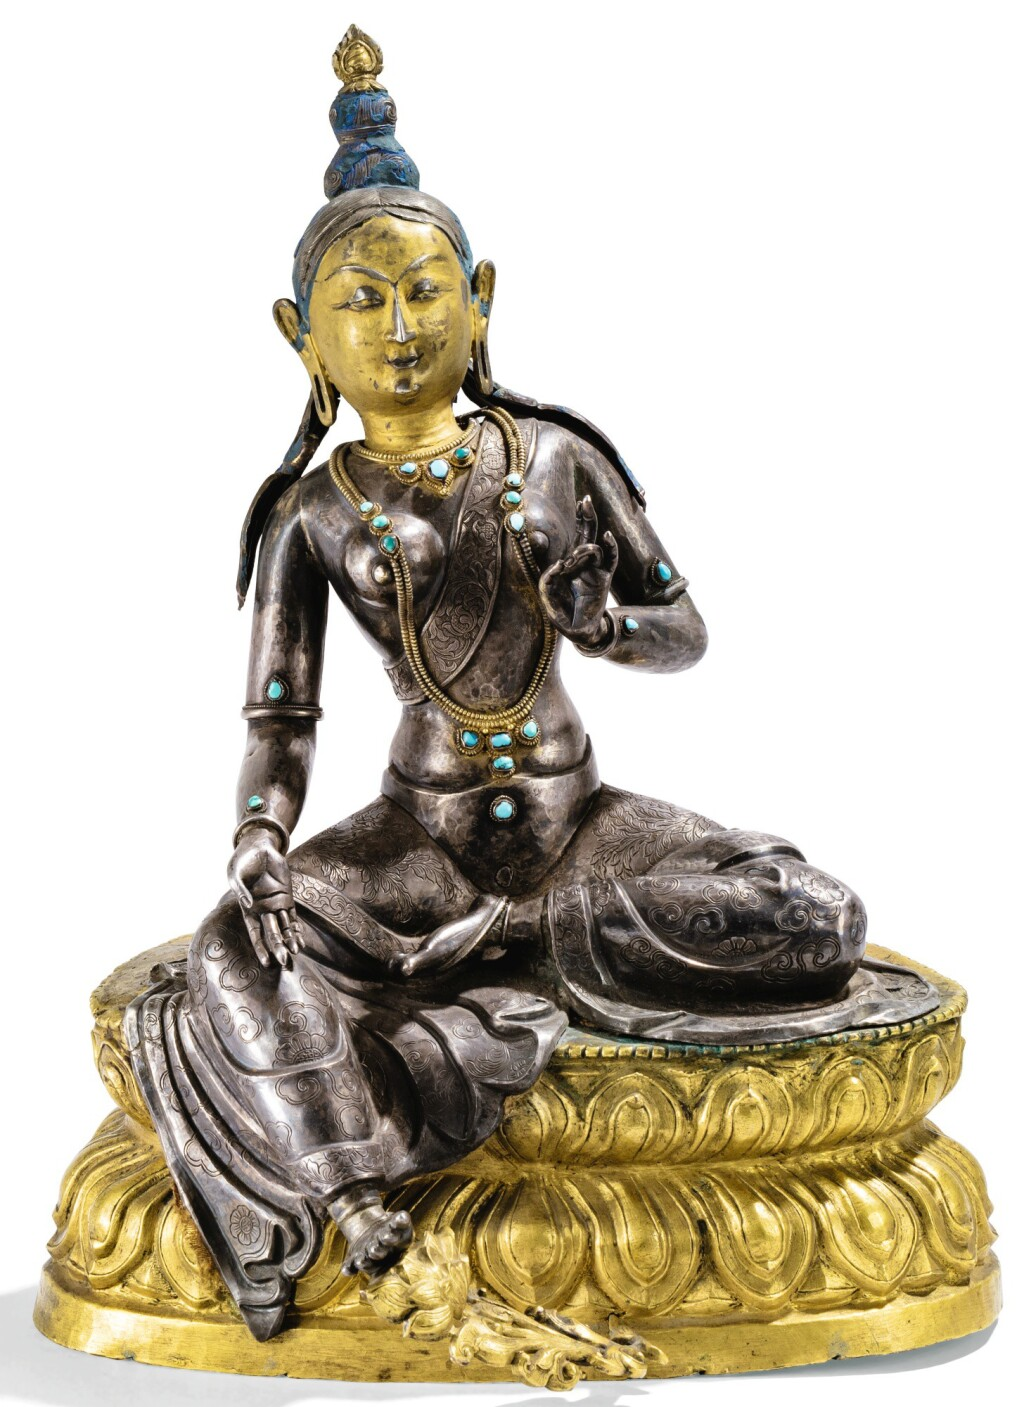 STATUETTE DE SYAMATARA EN CUIVRE DORÉ ET ARGENTÉ TIBET, XVIIIE SIÈCLE |  西藏 十八世紀 銀及鎏金銅嵌寳綠度母坐像 | A silver and gilt-copper figure of Syamatara, Tibet, 18th century